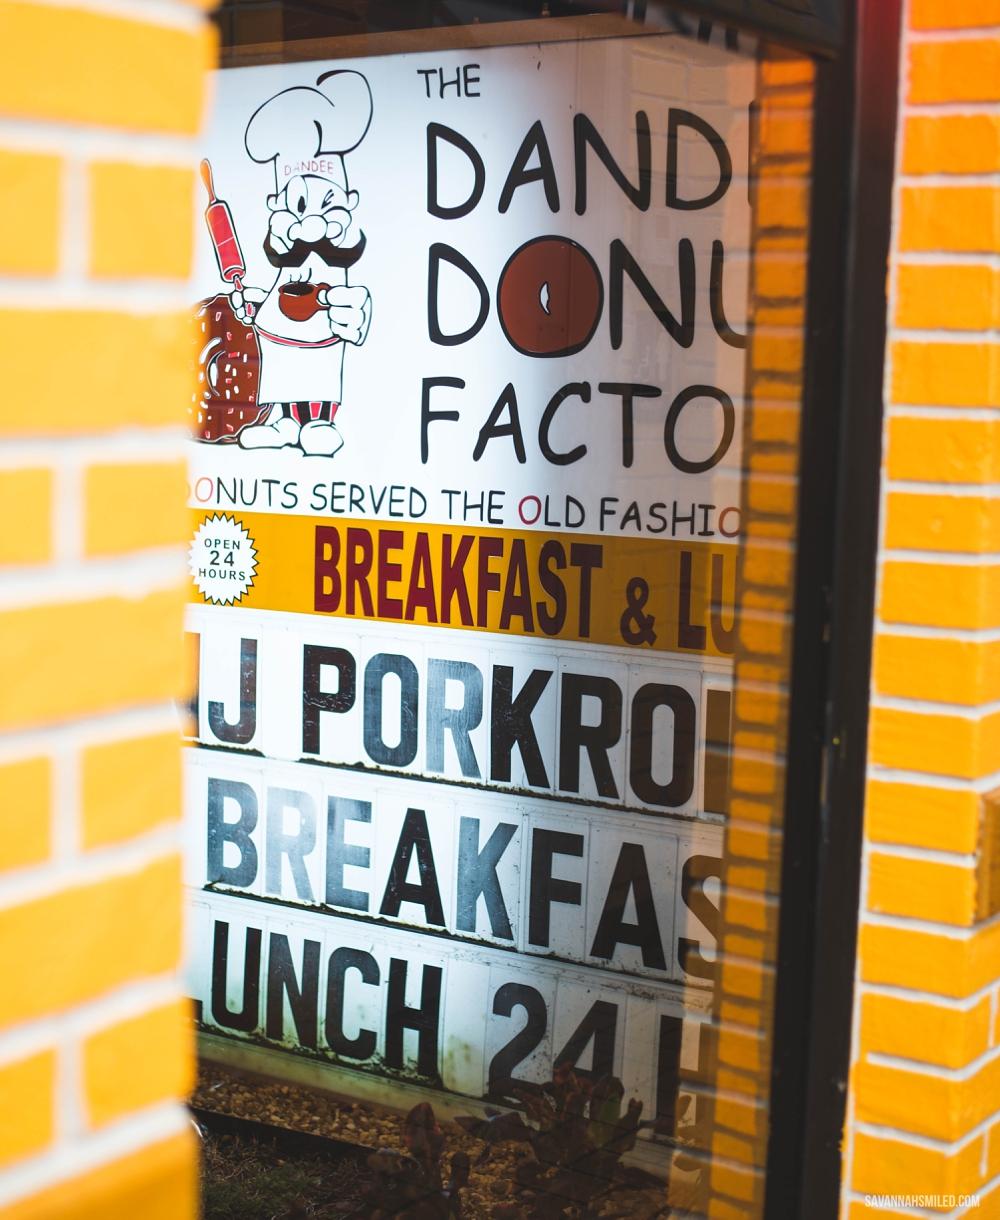 dandee-donuts-pampano-beach-fort-lauderdale-florida-5.jpg